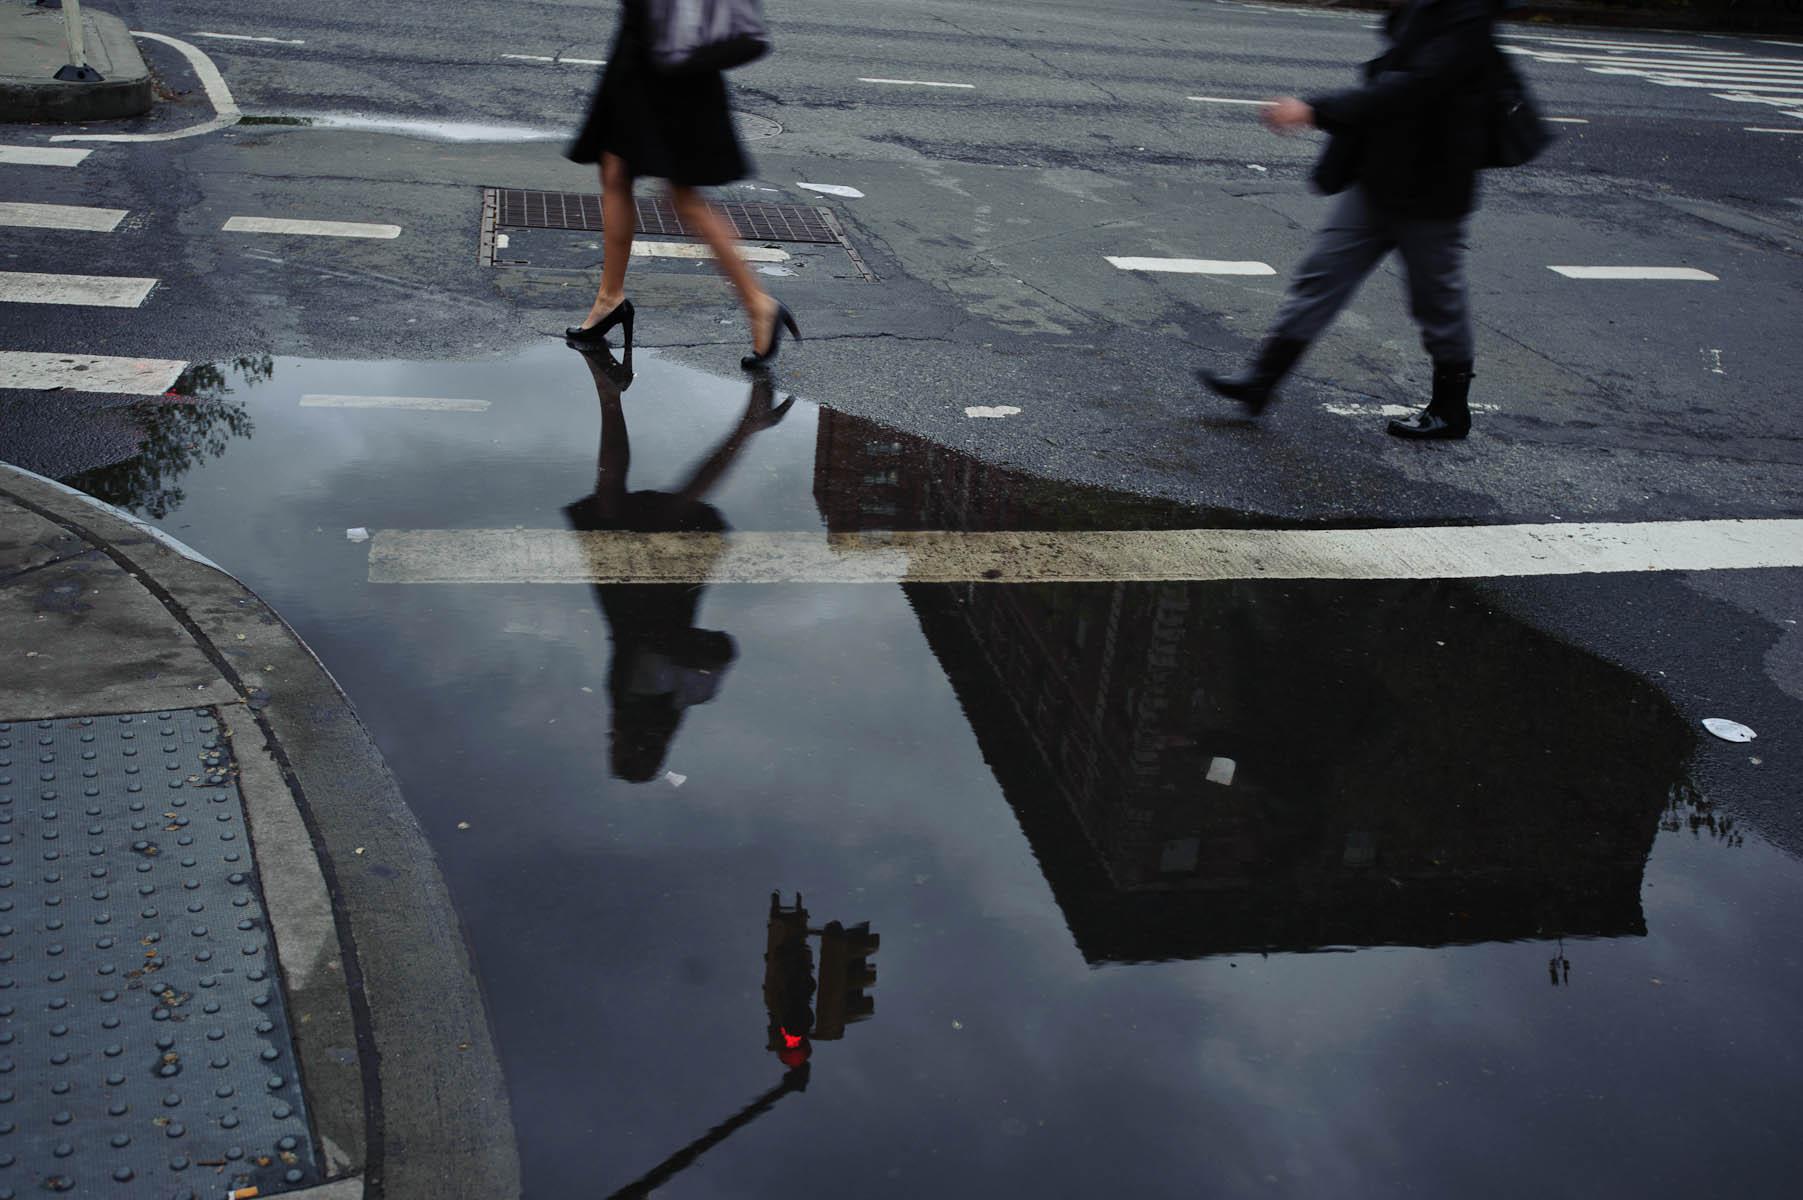 Manhattan's Lower East Side, New York, NY. (C) Juan Jose Reyes Lowereastside